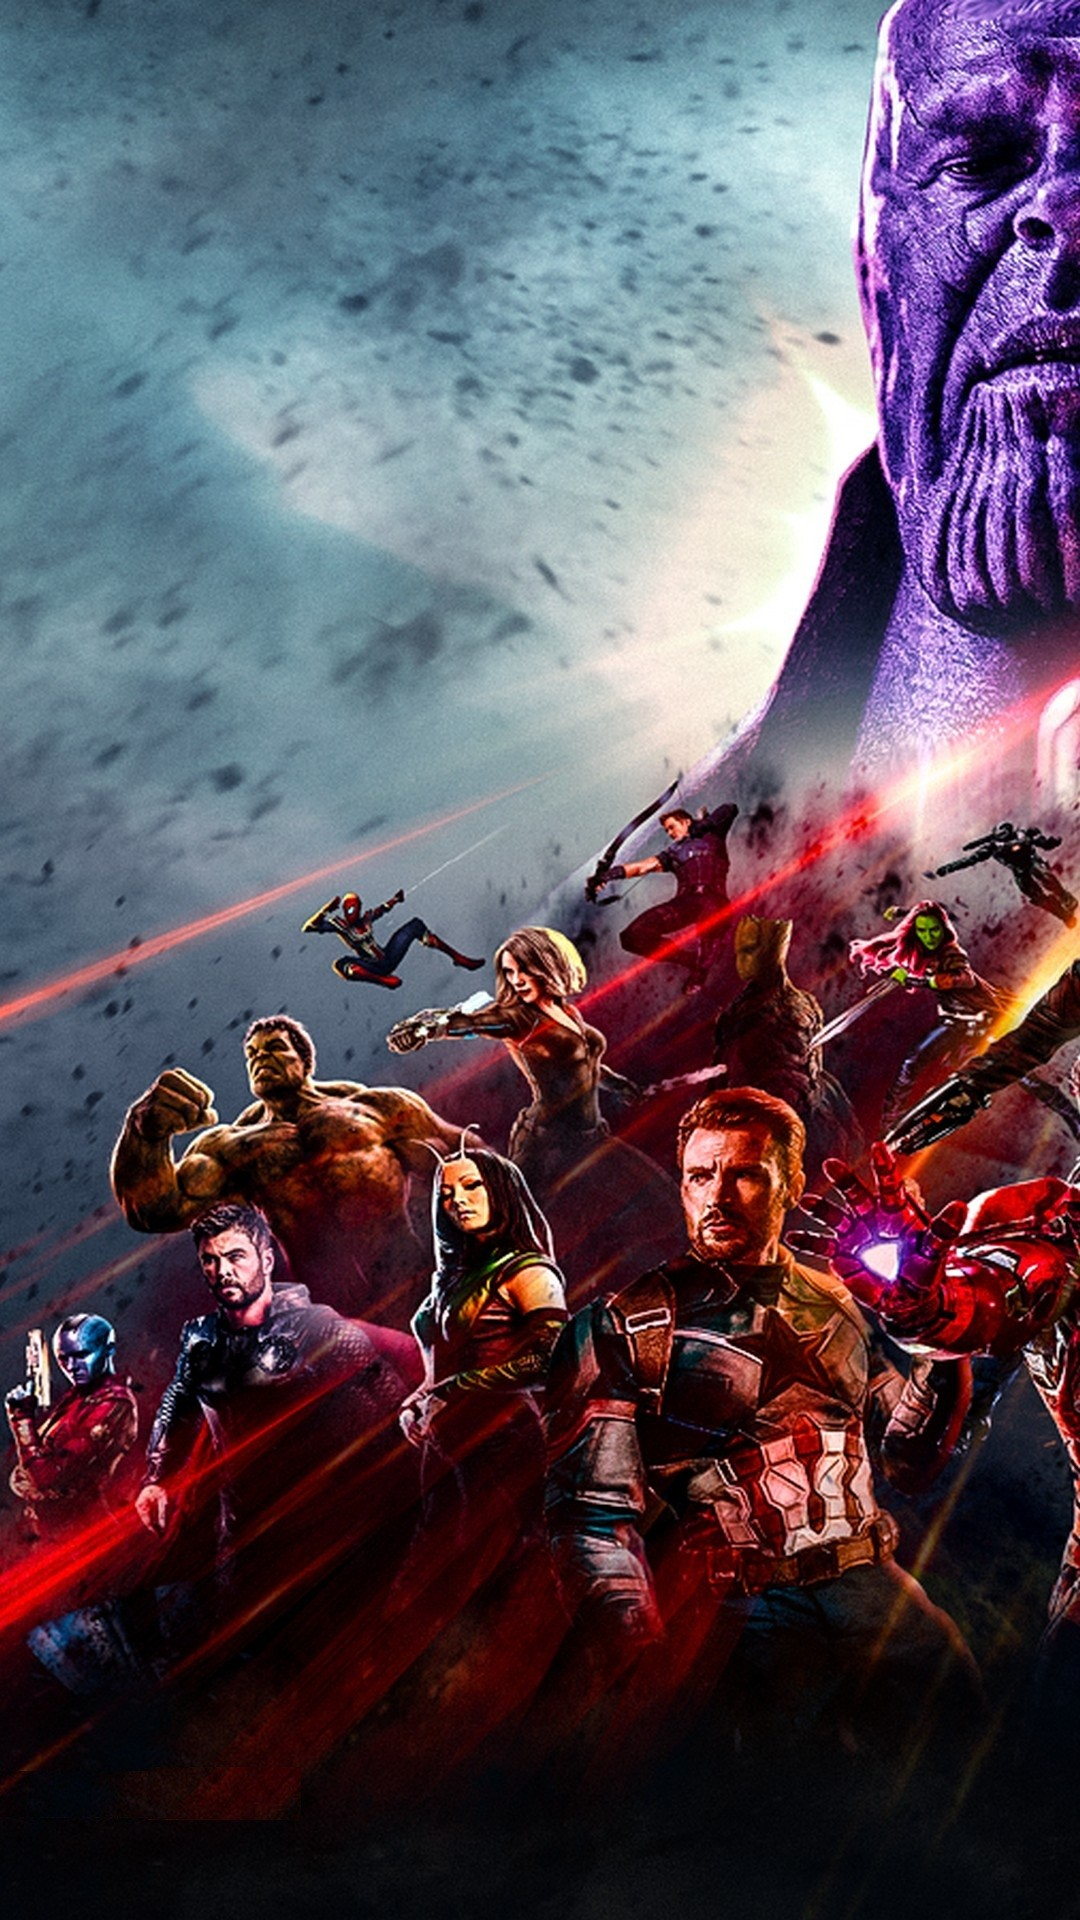 Avengers Infinity War Wallpaper Iphone Resolution - Avengers Wallpaper 4k Iphone , HD Wallpaper & Backgrounds